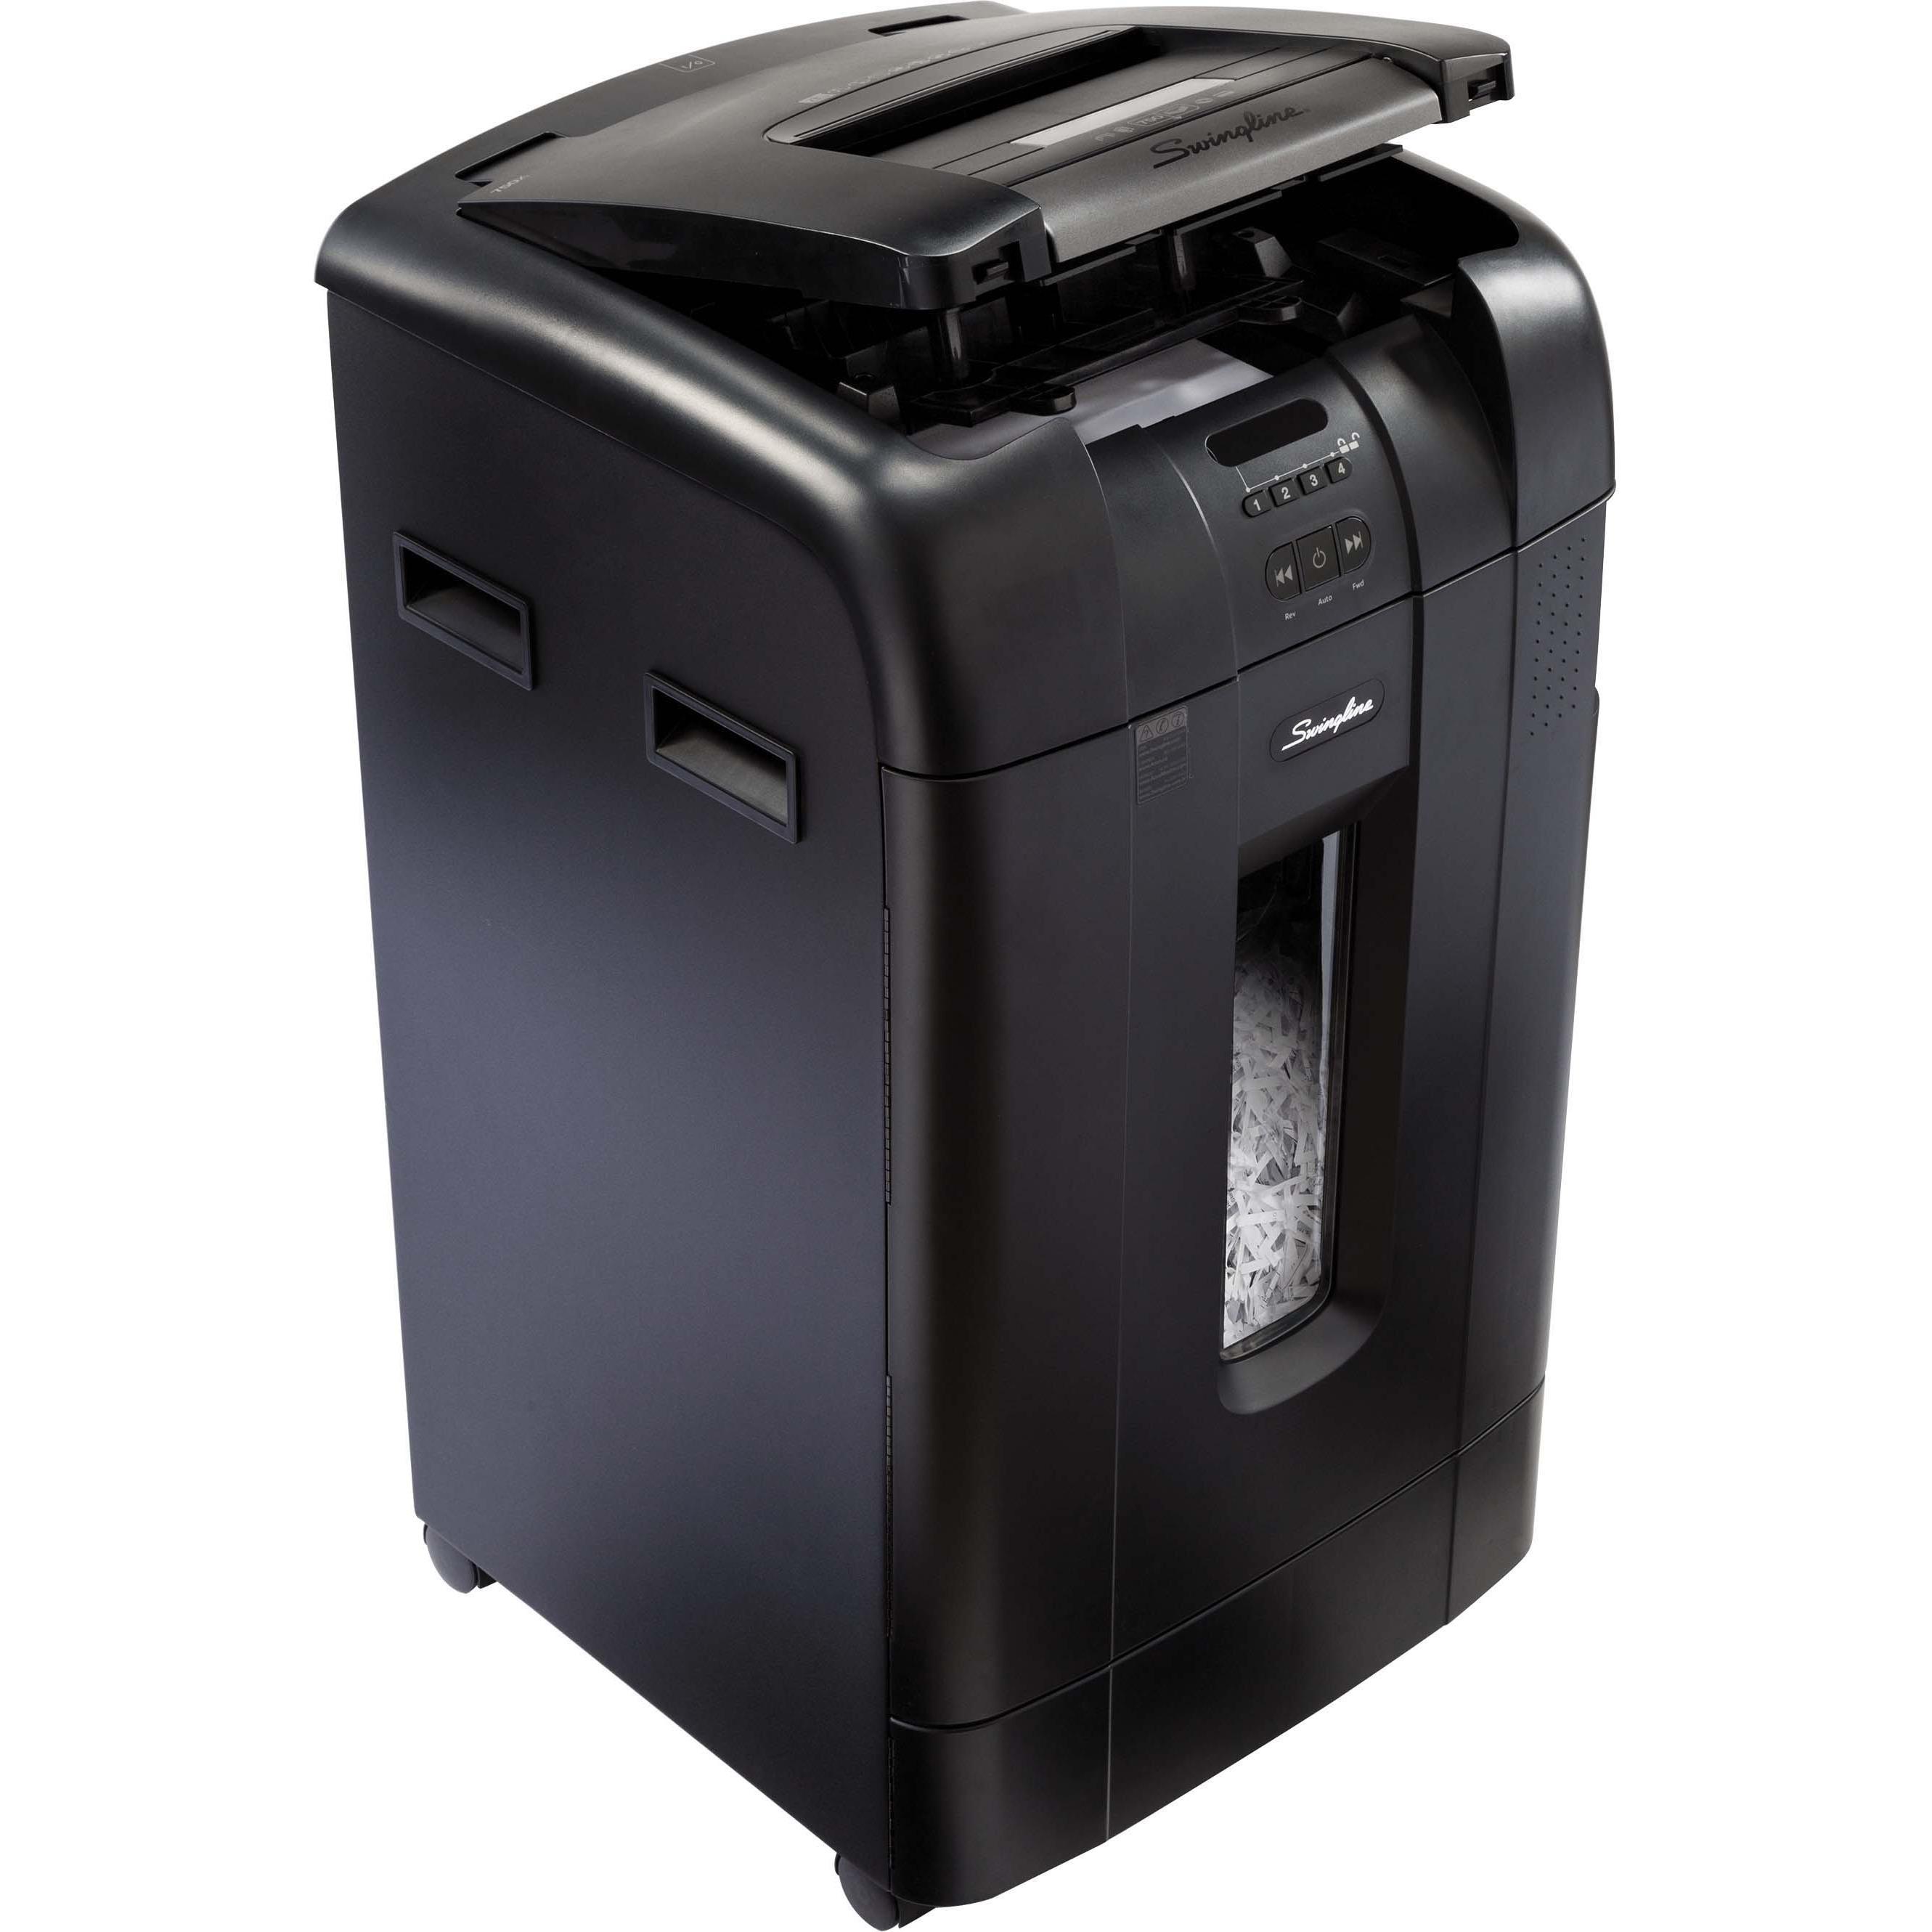 Swingline, SWI1757578, Stack-and-Shred™ 750X Auto Feed Shredder, 1 Each, Black